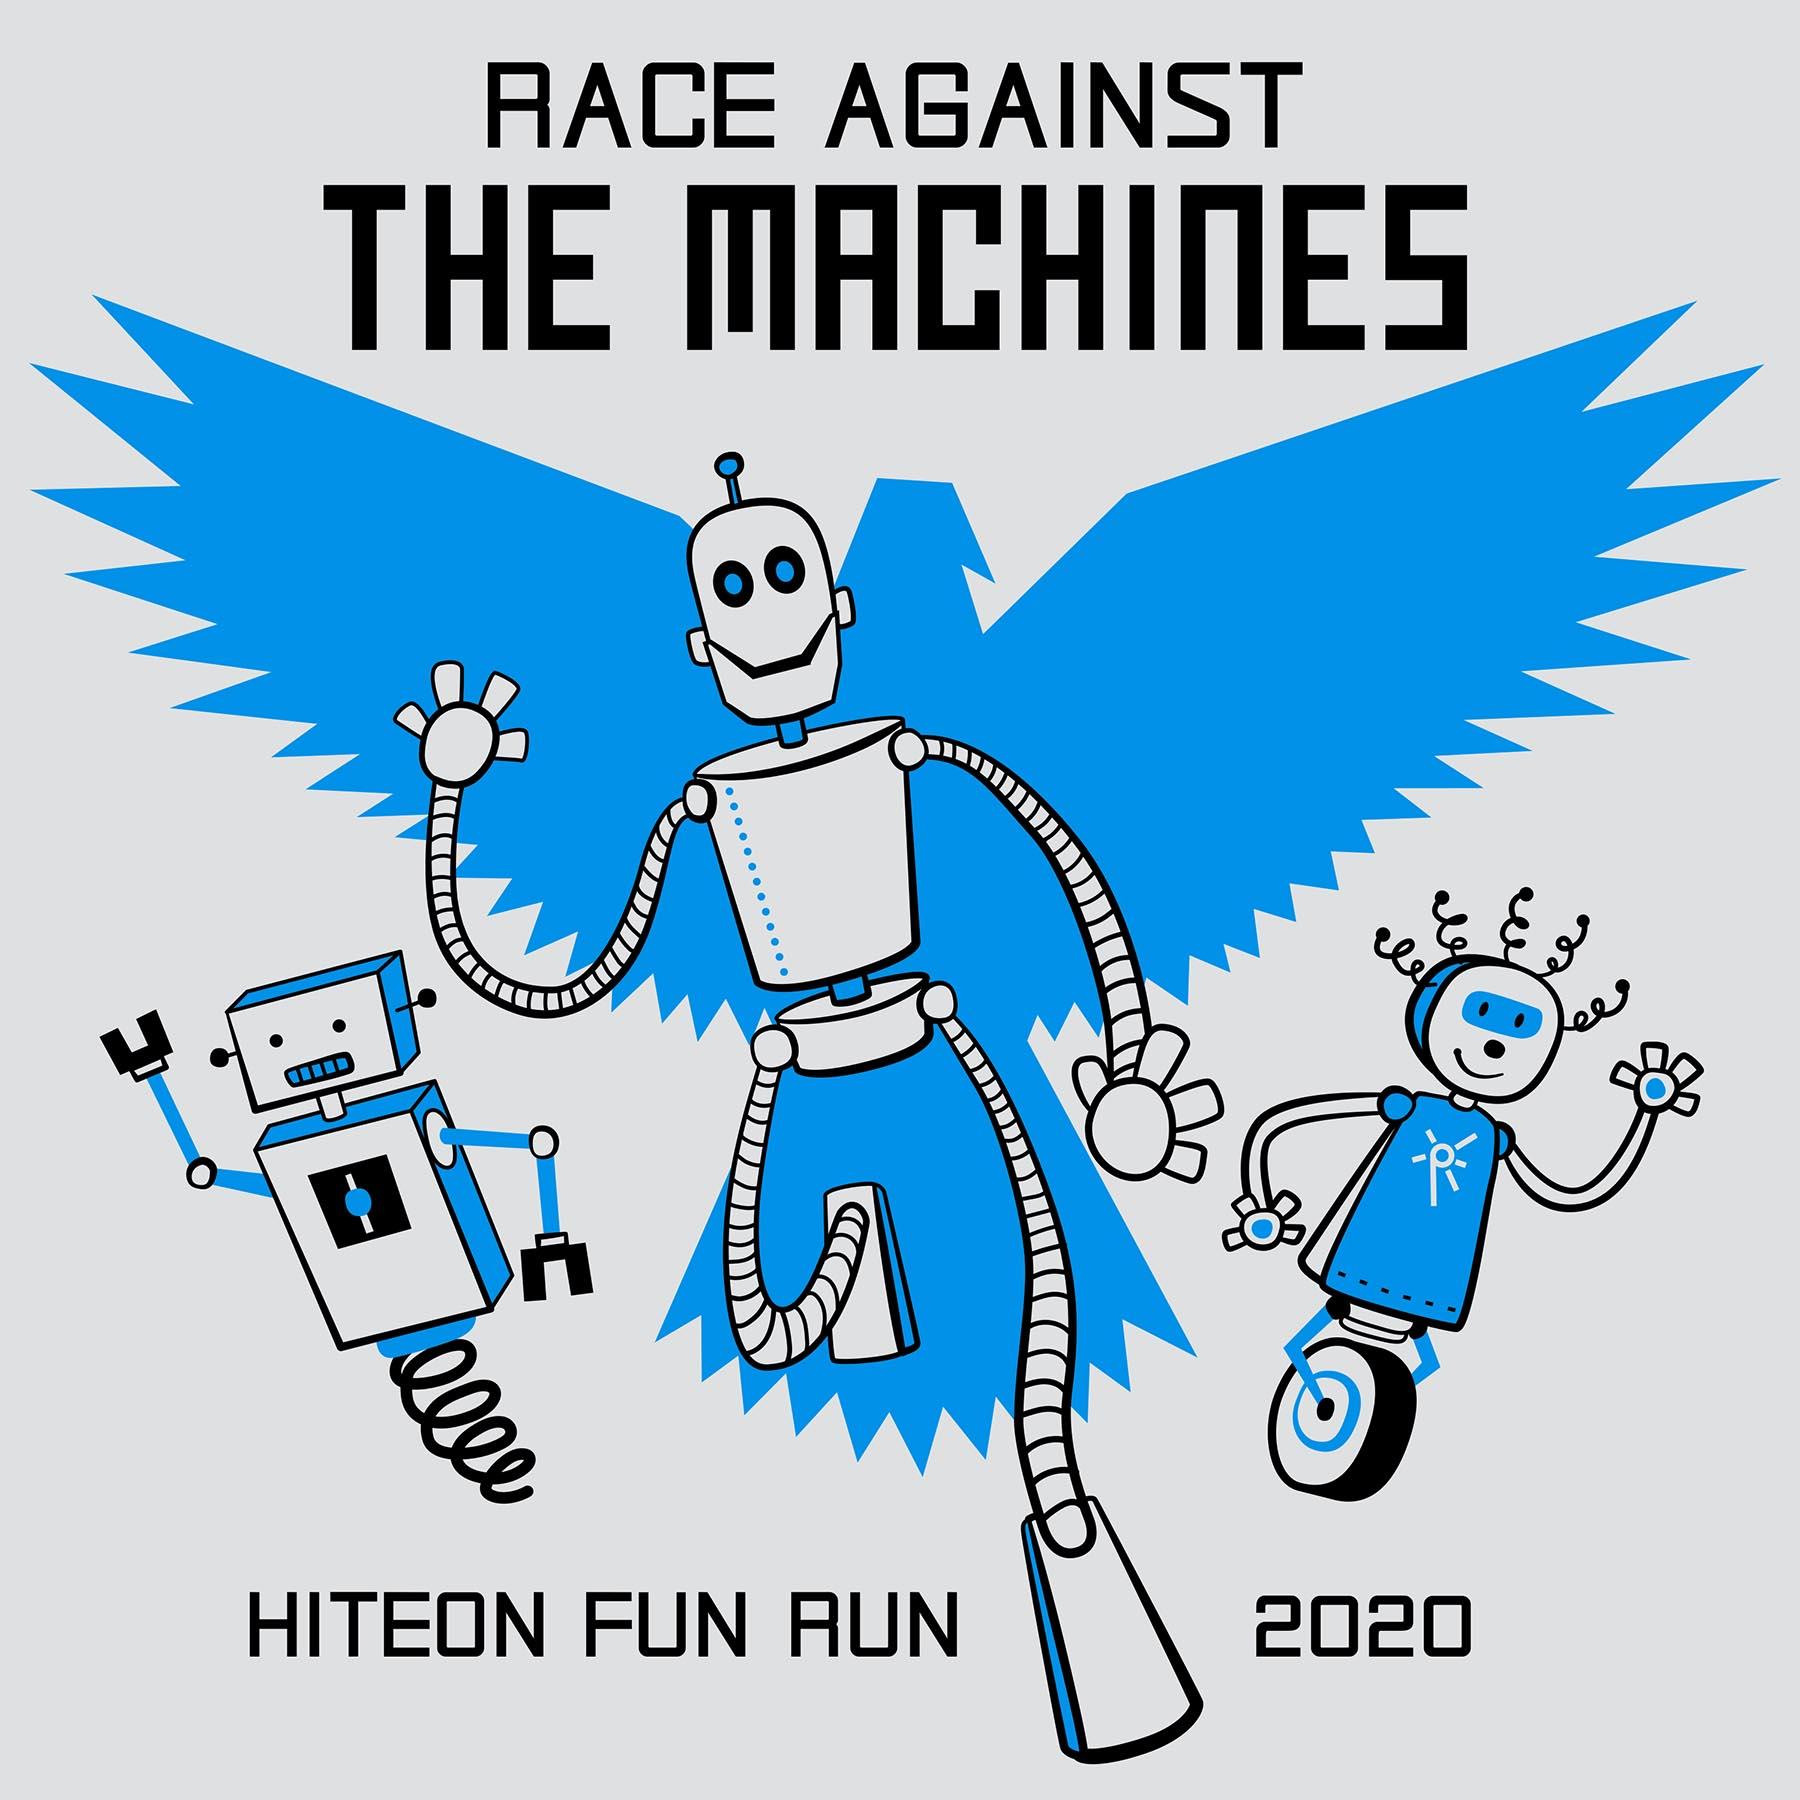 Elementary School Race Shirt Design